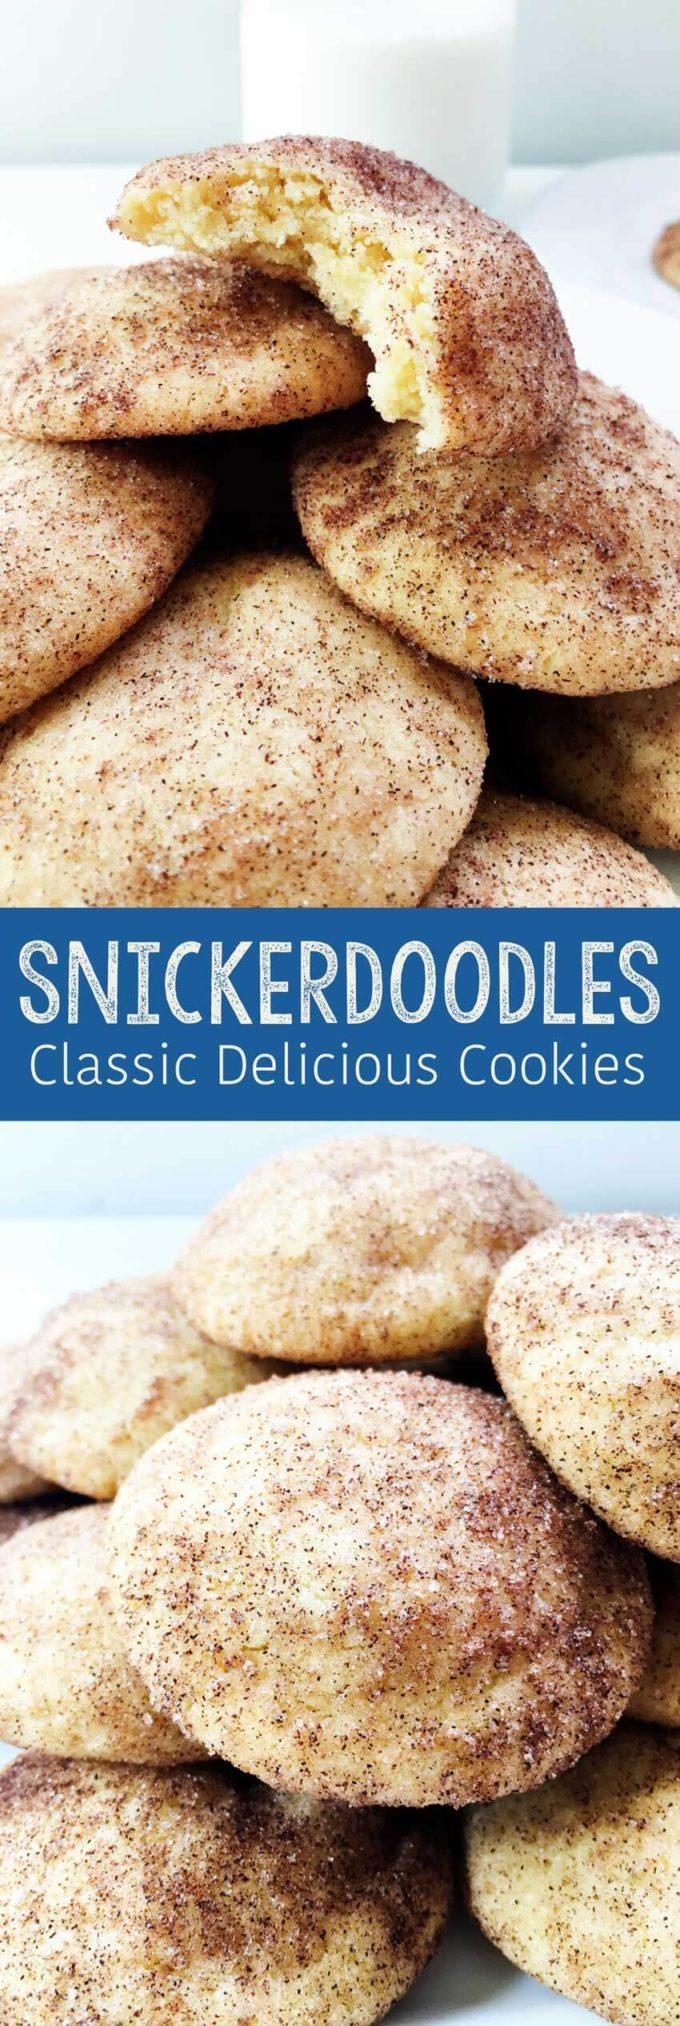 Snickerdoodle cookies, a classic delicious recipe